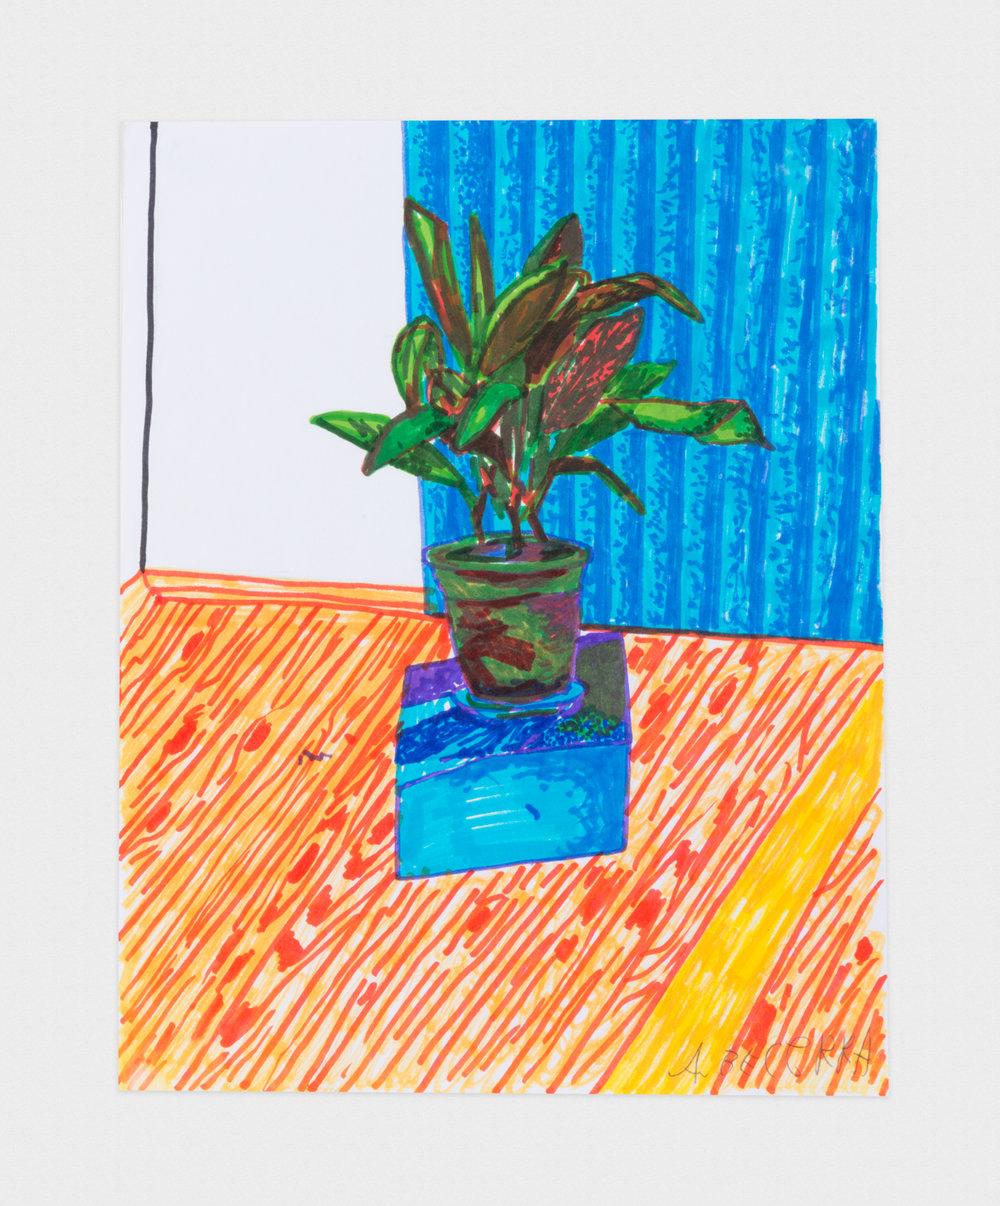 Alex Becerra  Apartment Interior  2016 Marker on paper 11h x 8 ½w in AB340